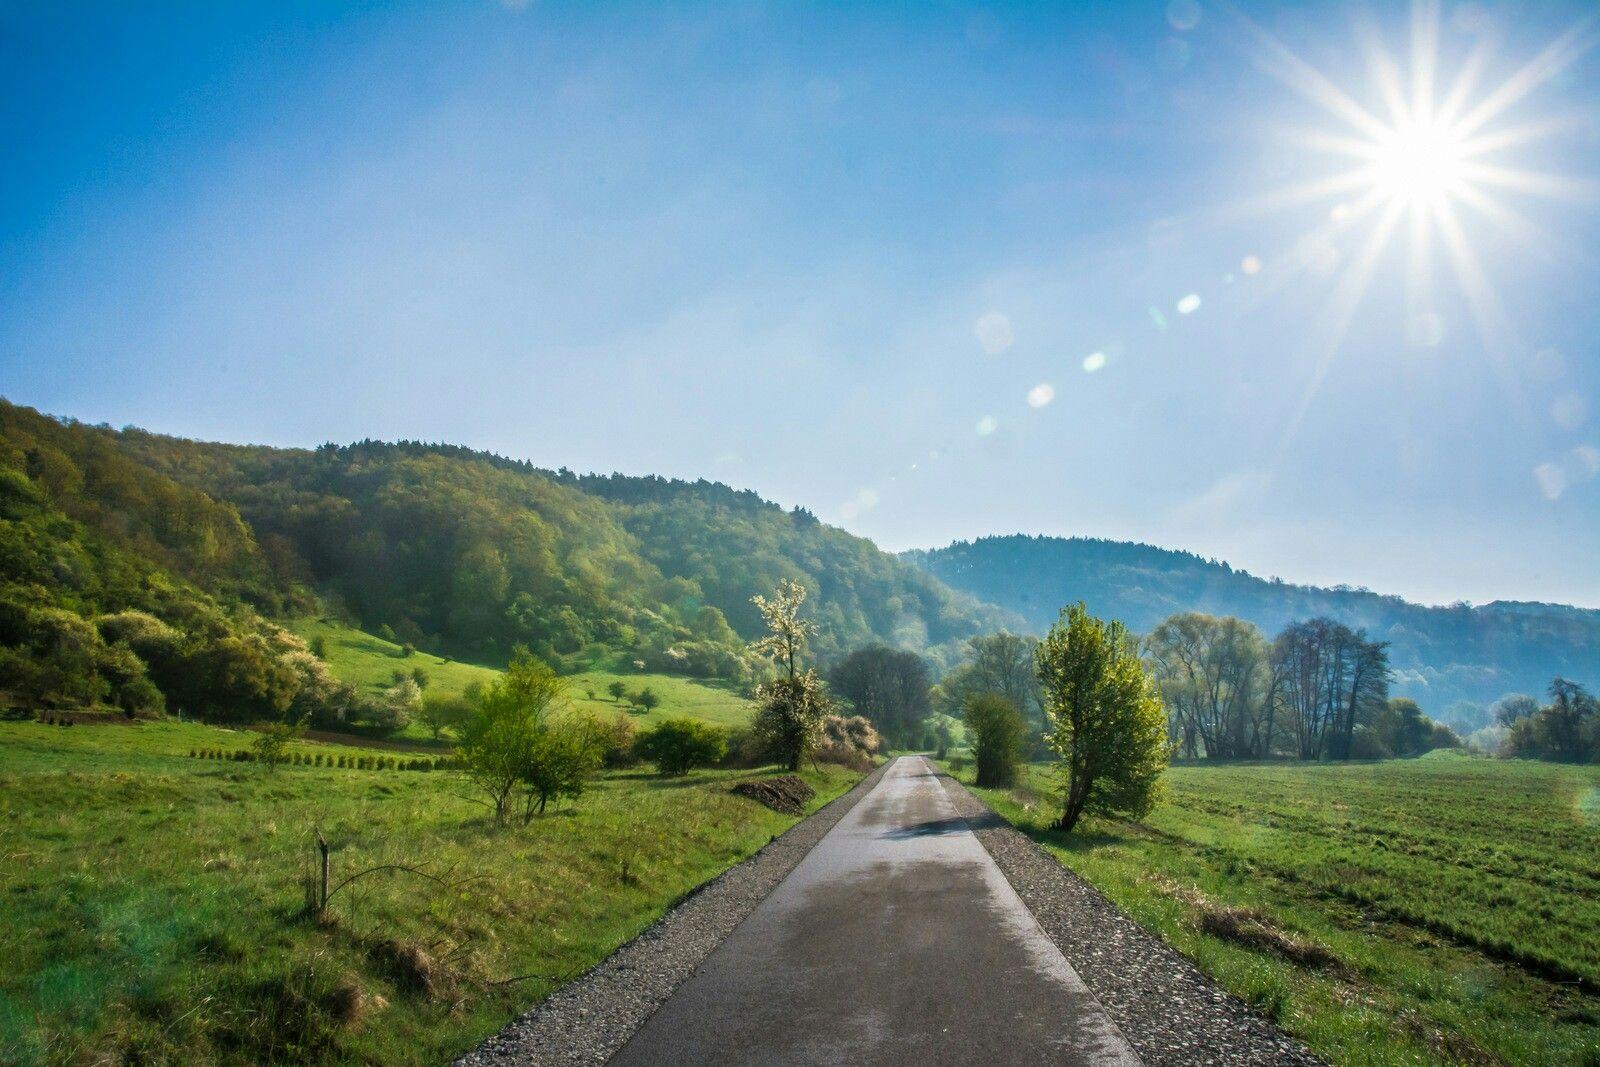 Kyffhäuserradweg